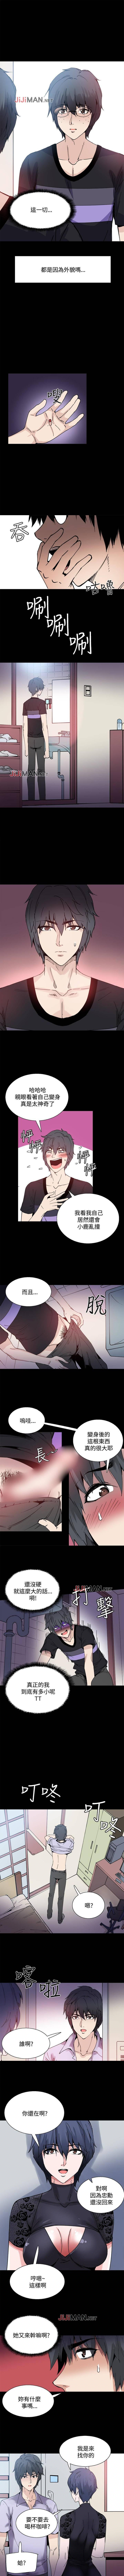 【已完结】Bodychange(作者:Seize & 死亡節奏) 第1~33话 54